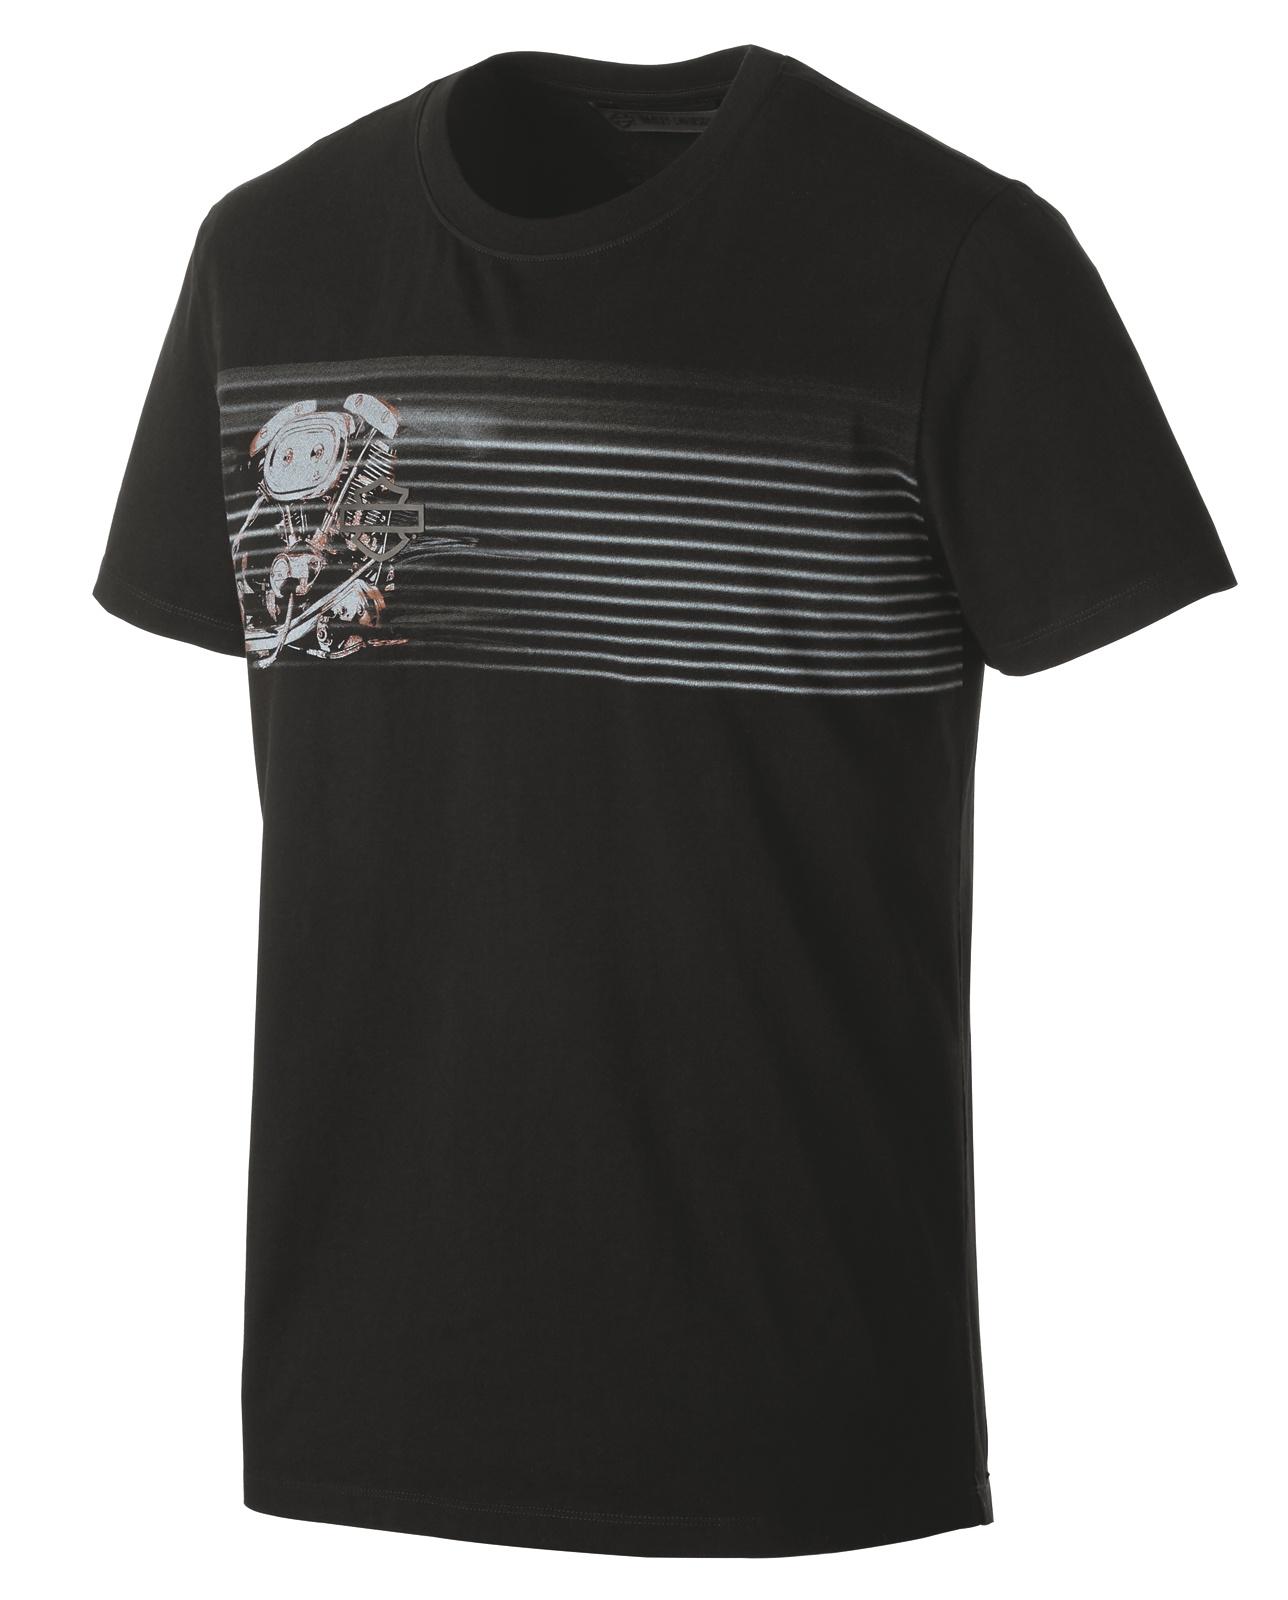 f85f312bb5 ... H-D Motorclothes Harley-Davidson T-Shirt Offset Engine black - 99175-19VM  ...